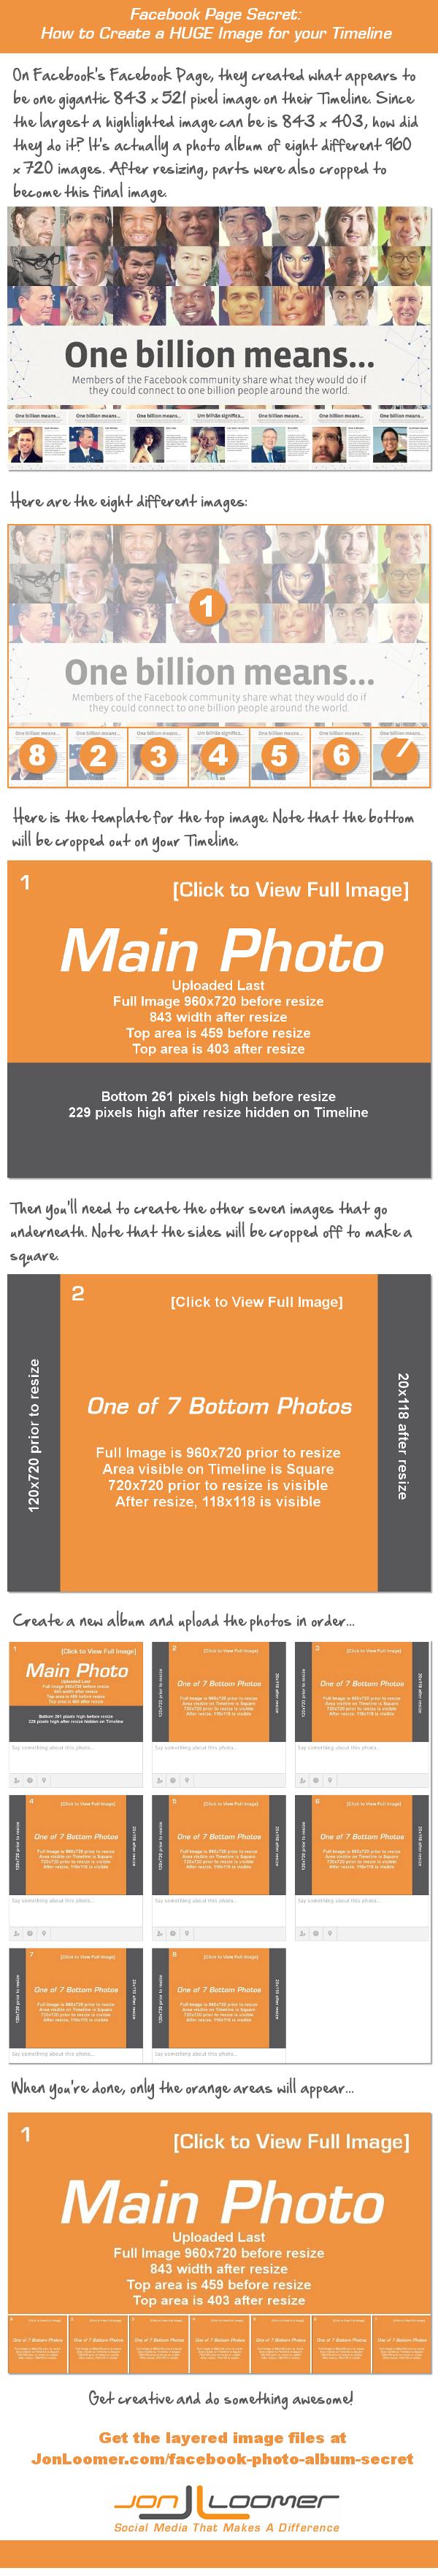 facebook photo album secret Facebook Page Secret: Create a HUGE Image for Your Timeline [Infographic]